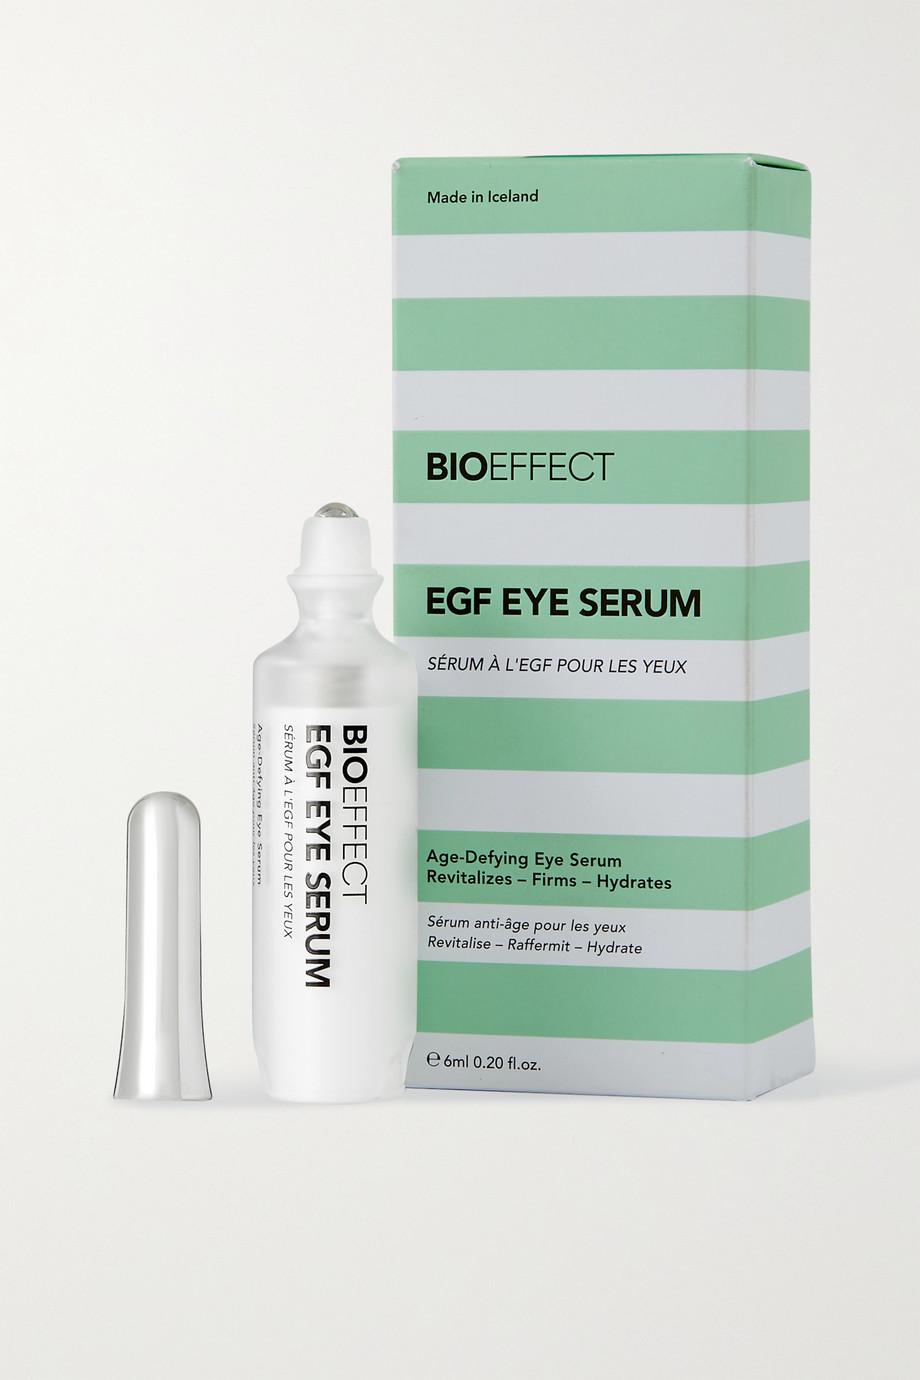 BIOEFFECT EGF Eye Serum, 6ml